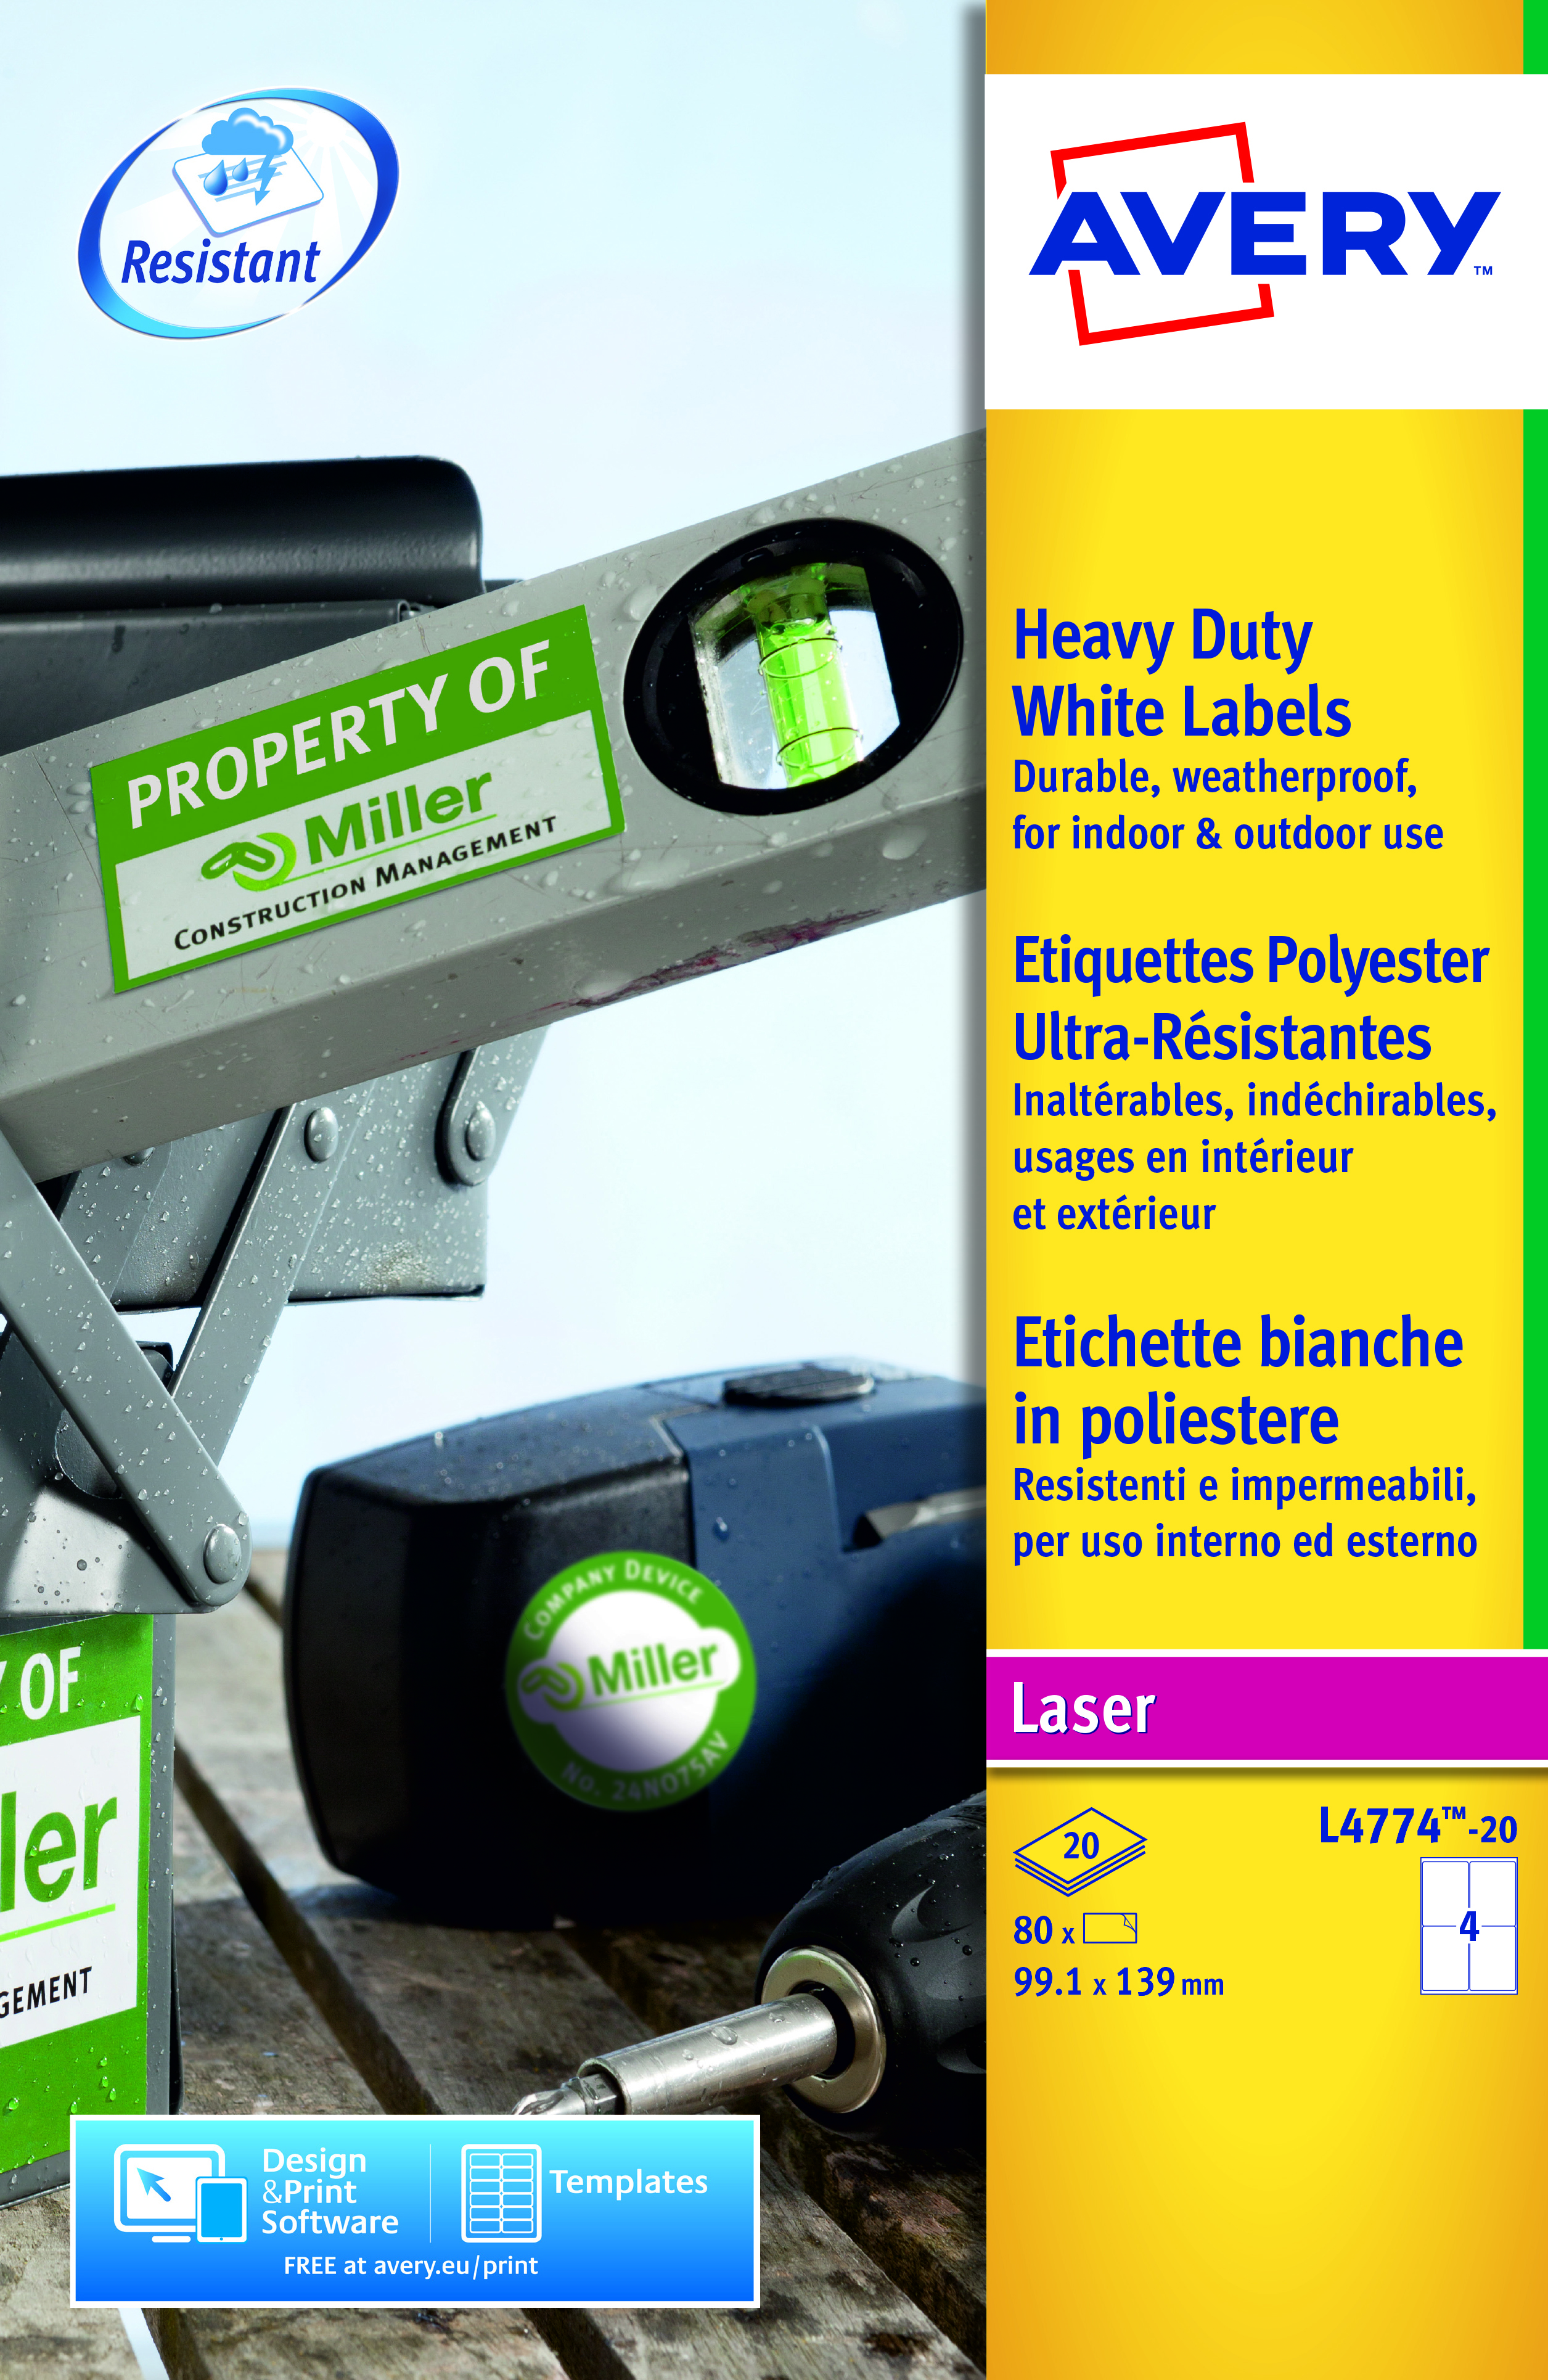 Avery HeavyDuty Label 99x139mm PK80